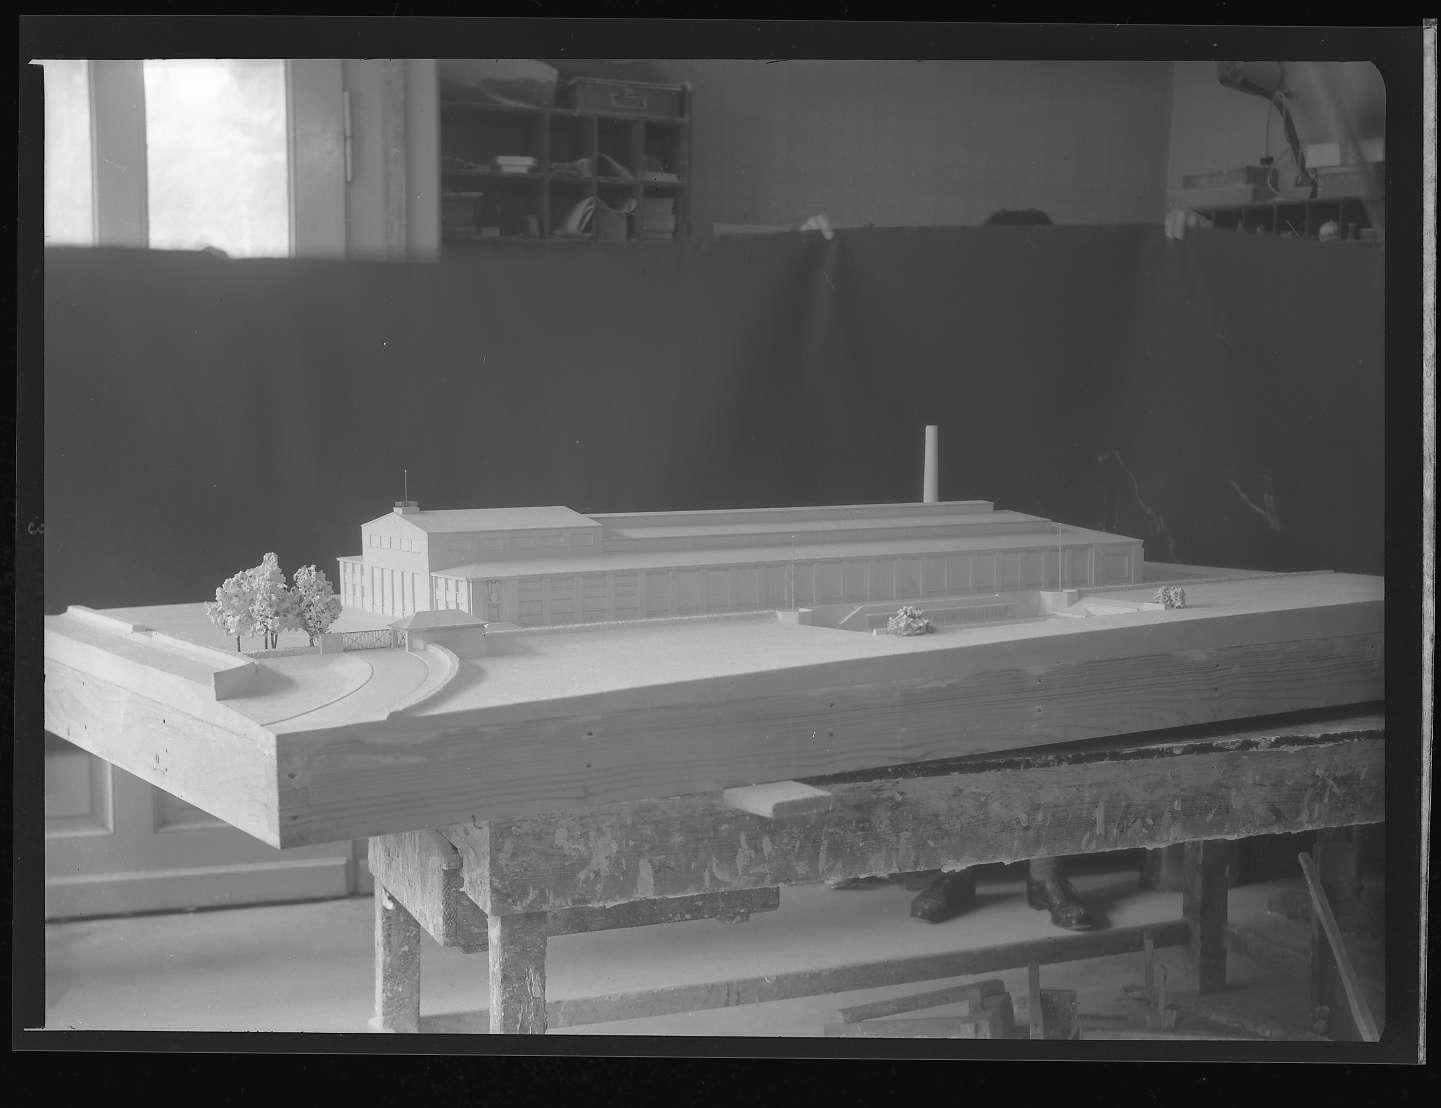 Kornwestheim, Zentralschmiede, Architekturmodell 1, Abb. b